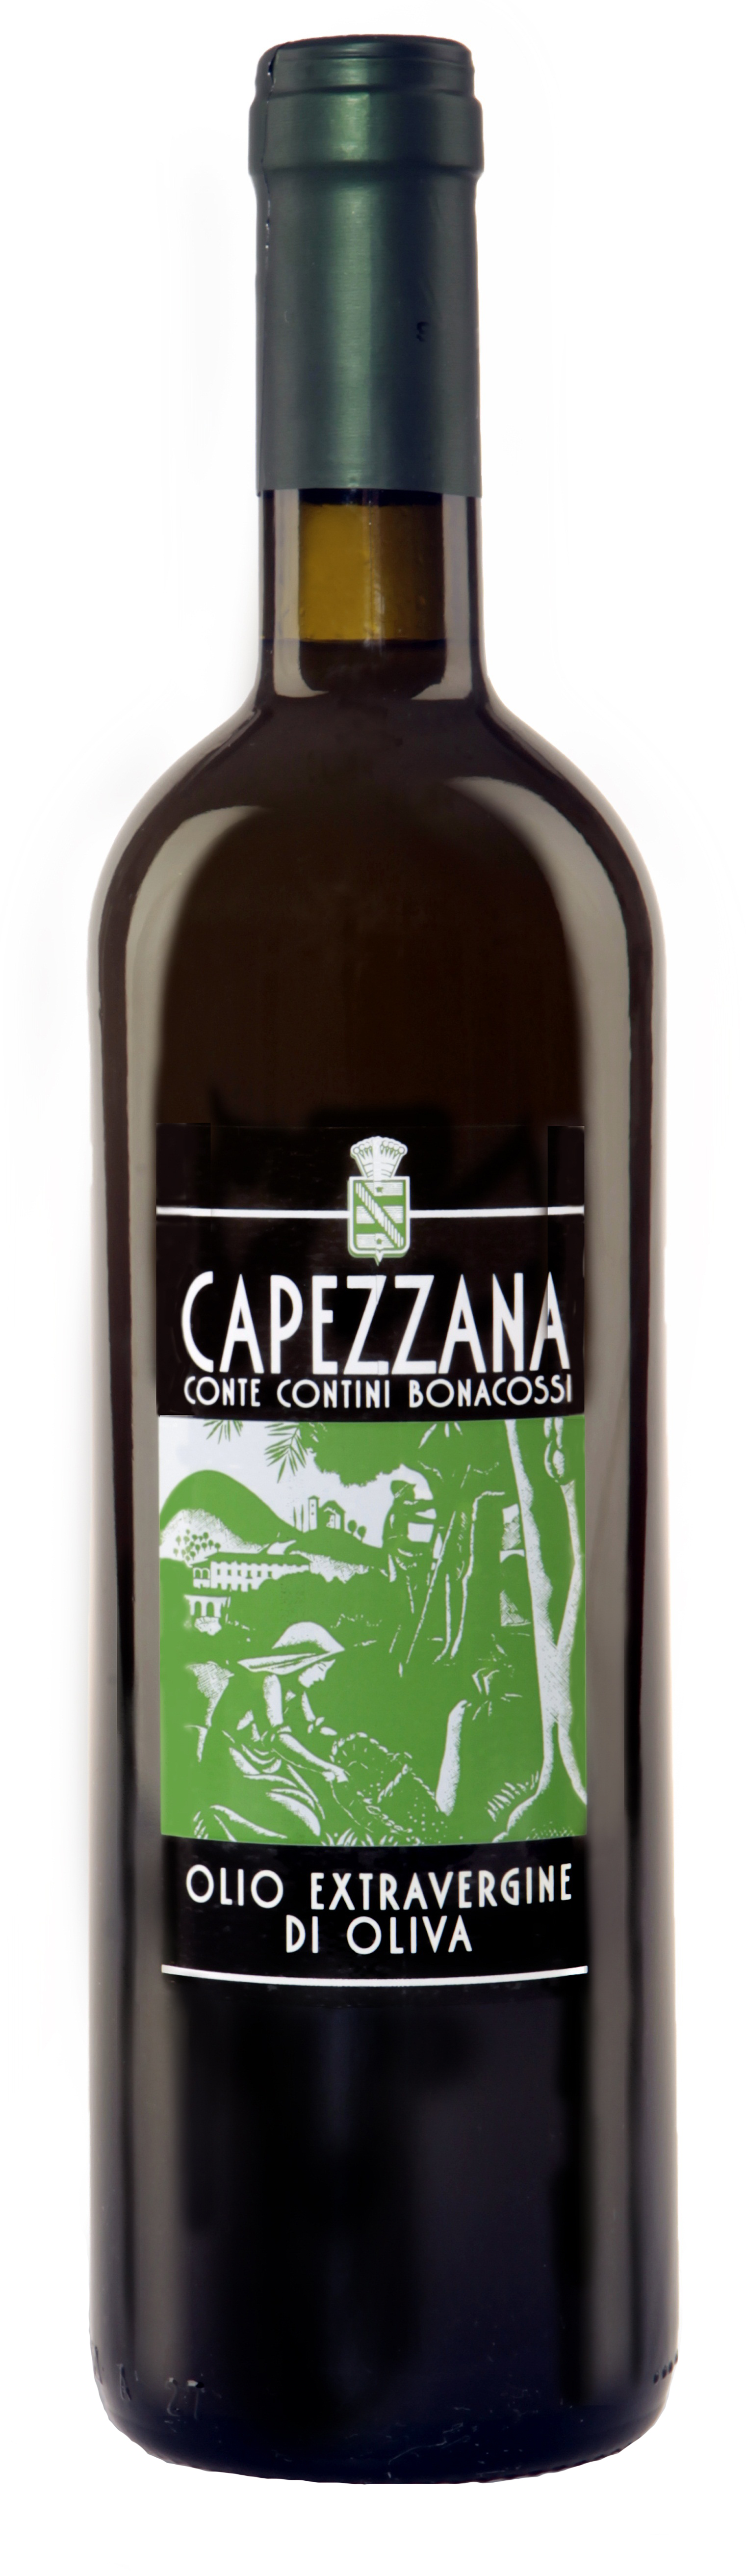 Capezzana, Organic Extra Virgin Olive Oil (Non-Filtered) 2017